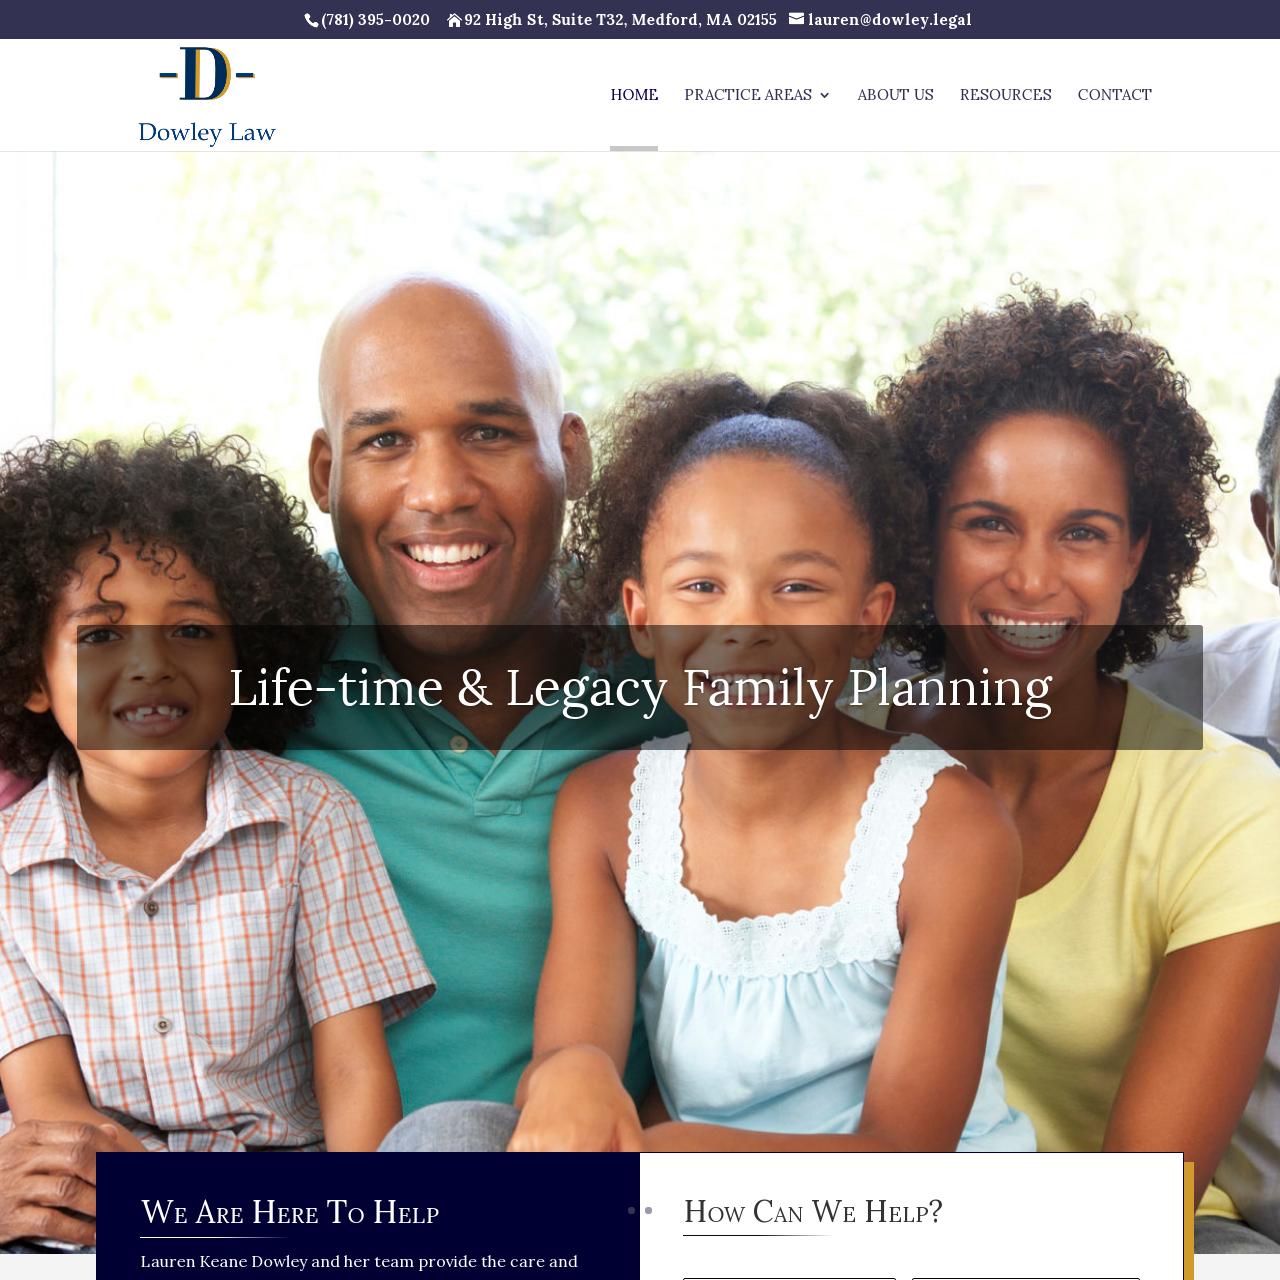 Medford Web Design